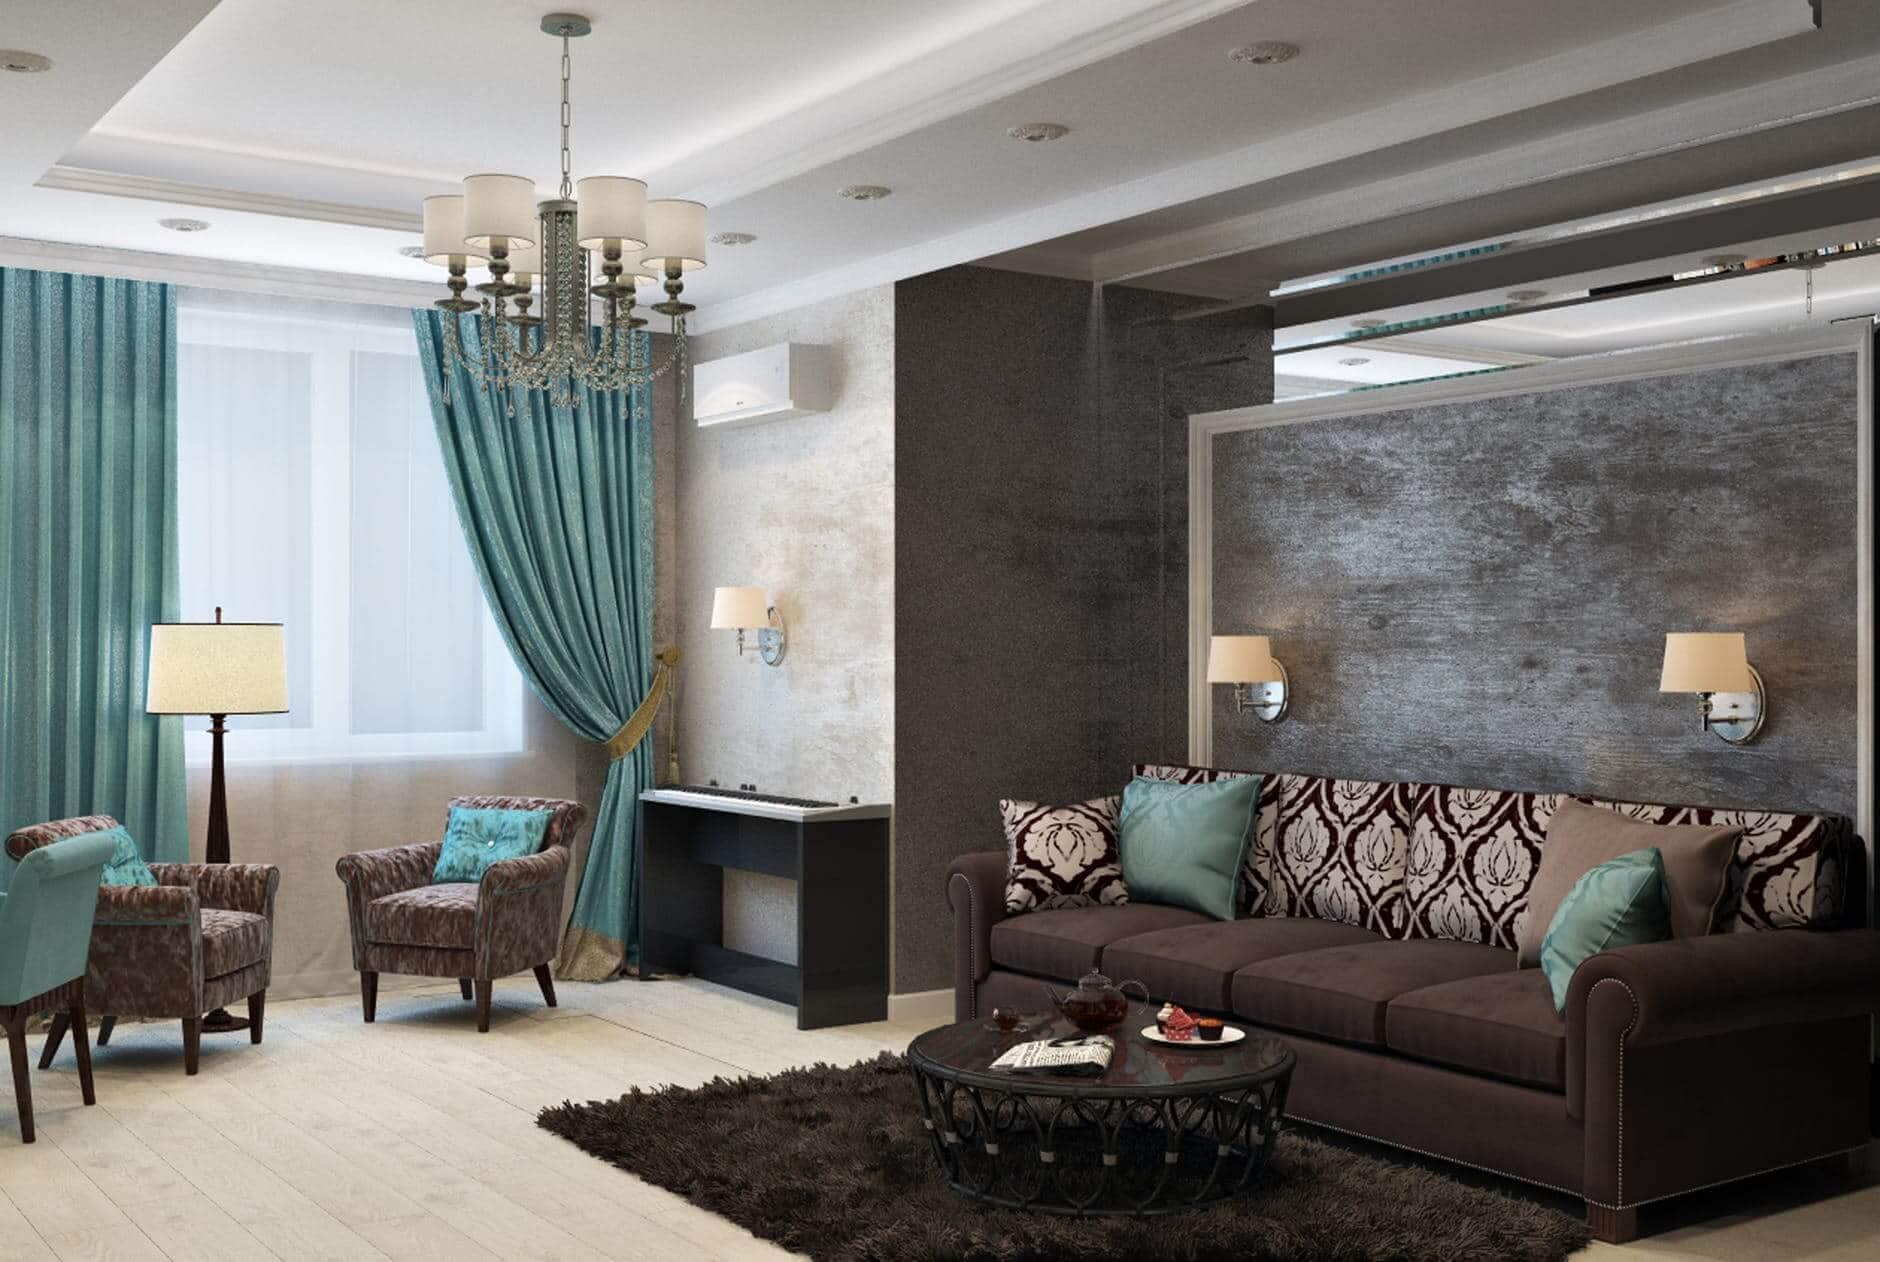 Rug Designs For Living Room 7